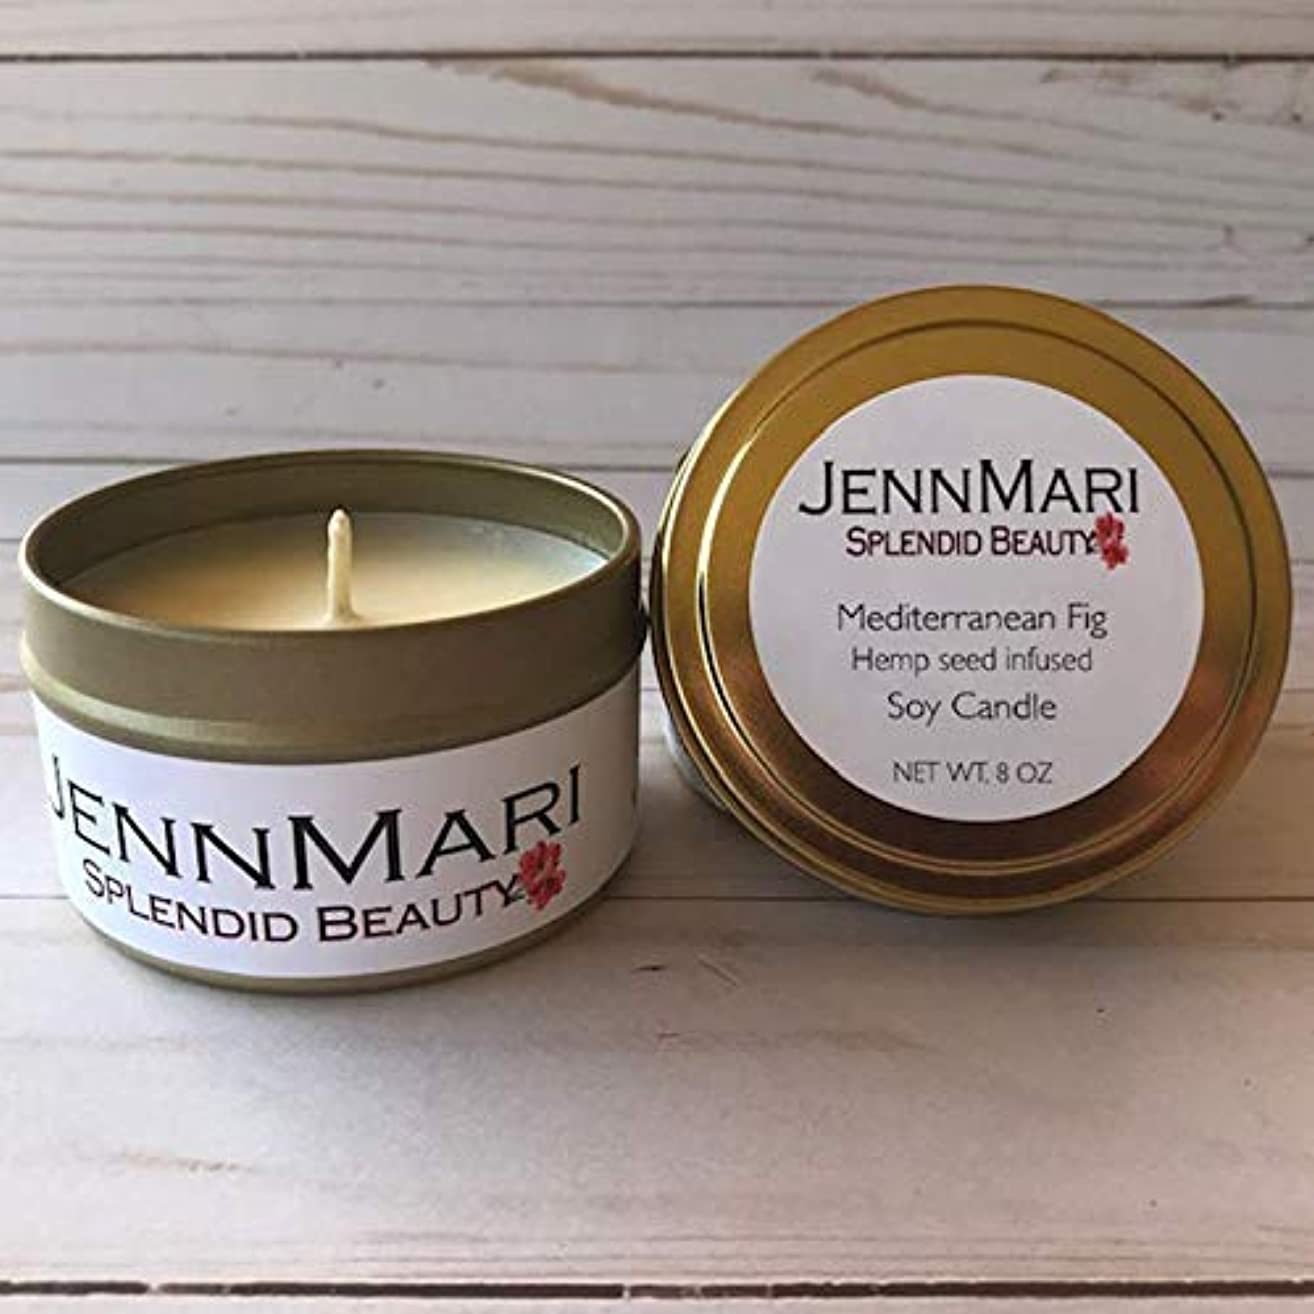 Splendid Beauty   Mediterranean Fig Hemp Soy Candle 6 Oz Tin   Handmade   Eco-friendly   Vegan   Cotton Wick   100% Soy Wax